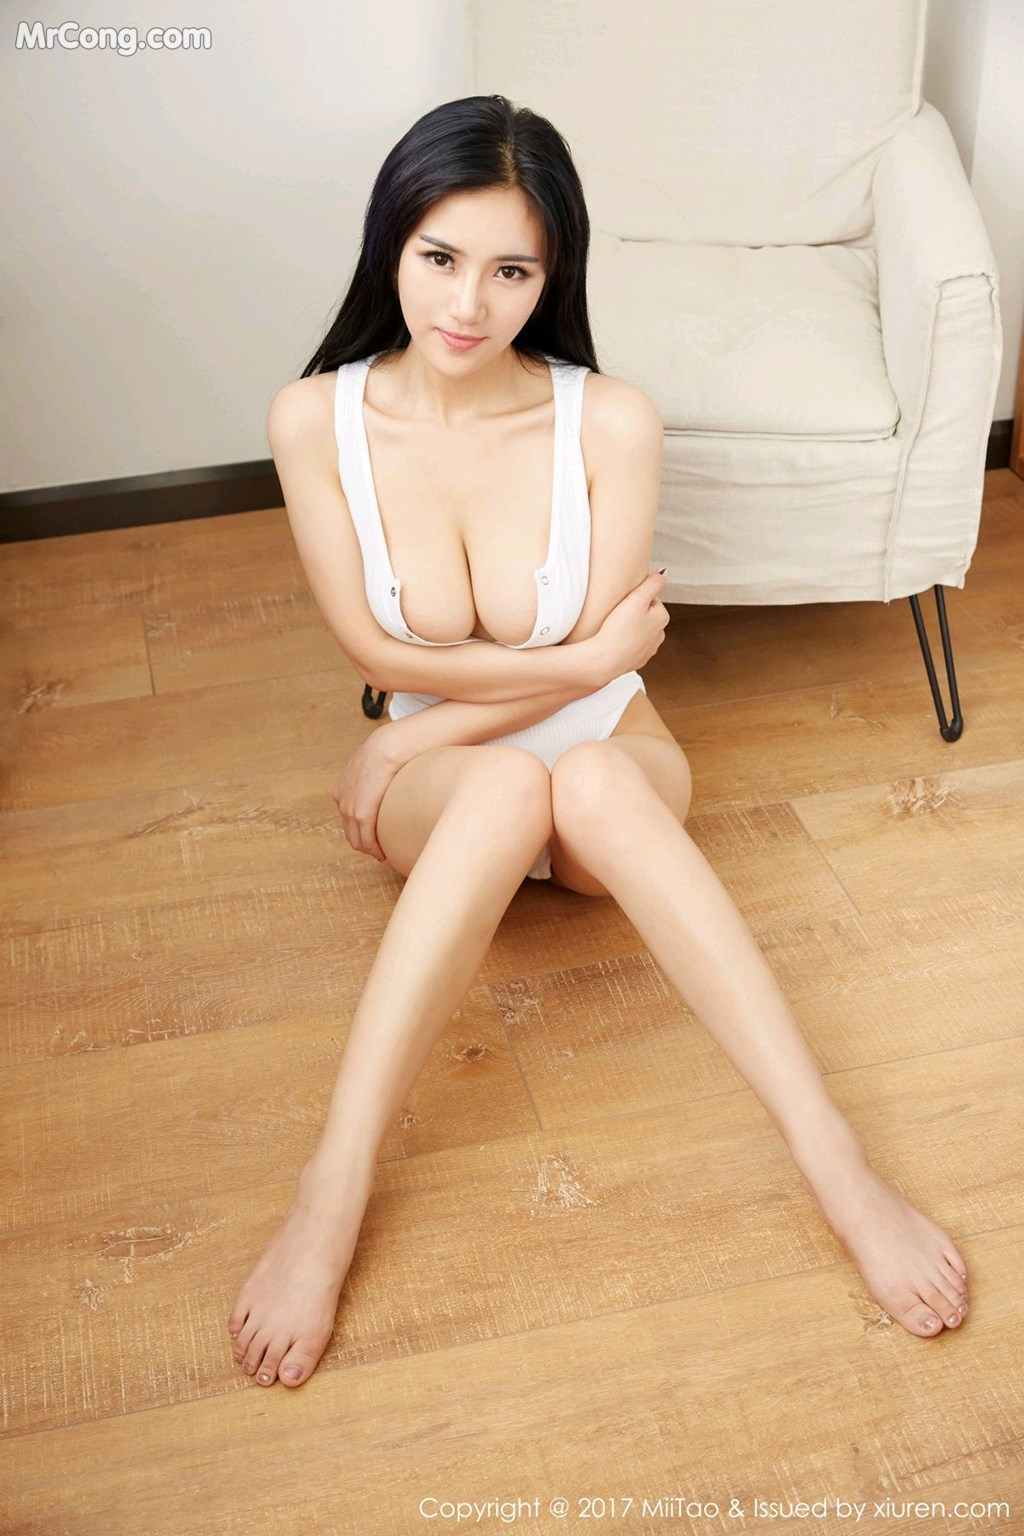 Image MiiTao-Vol.075-Meng-Xi-MrCong.com-009 in post MiiTao Vol.075: Người mẫu Meng Xi (梦溪) (51 ảnh)